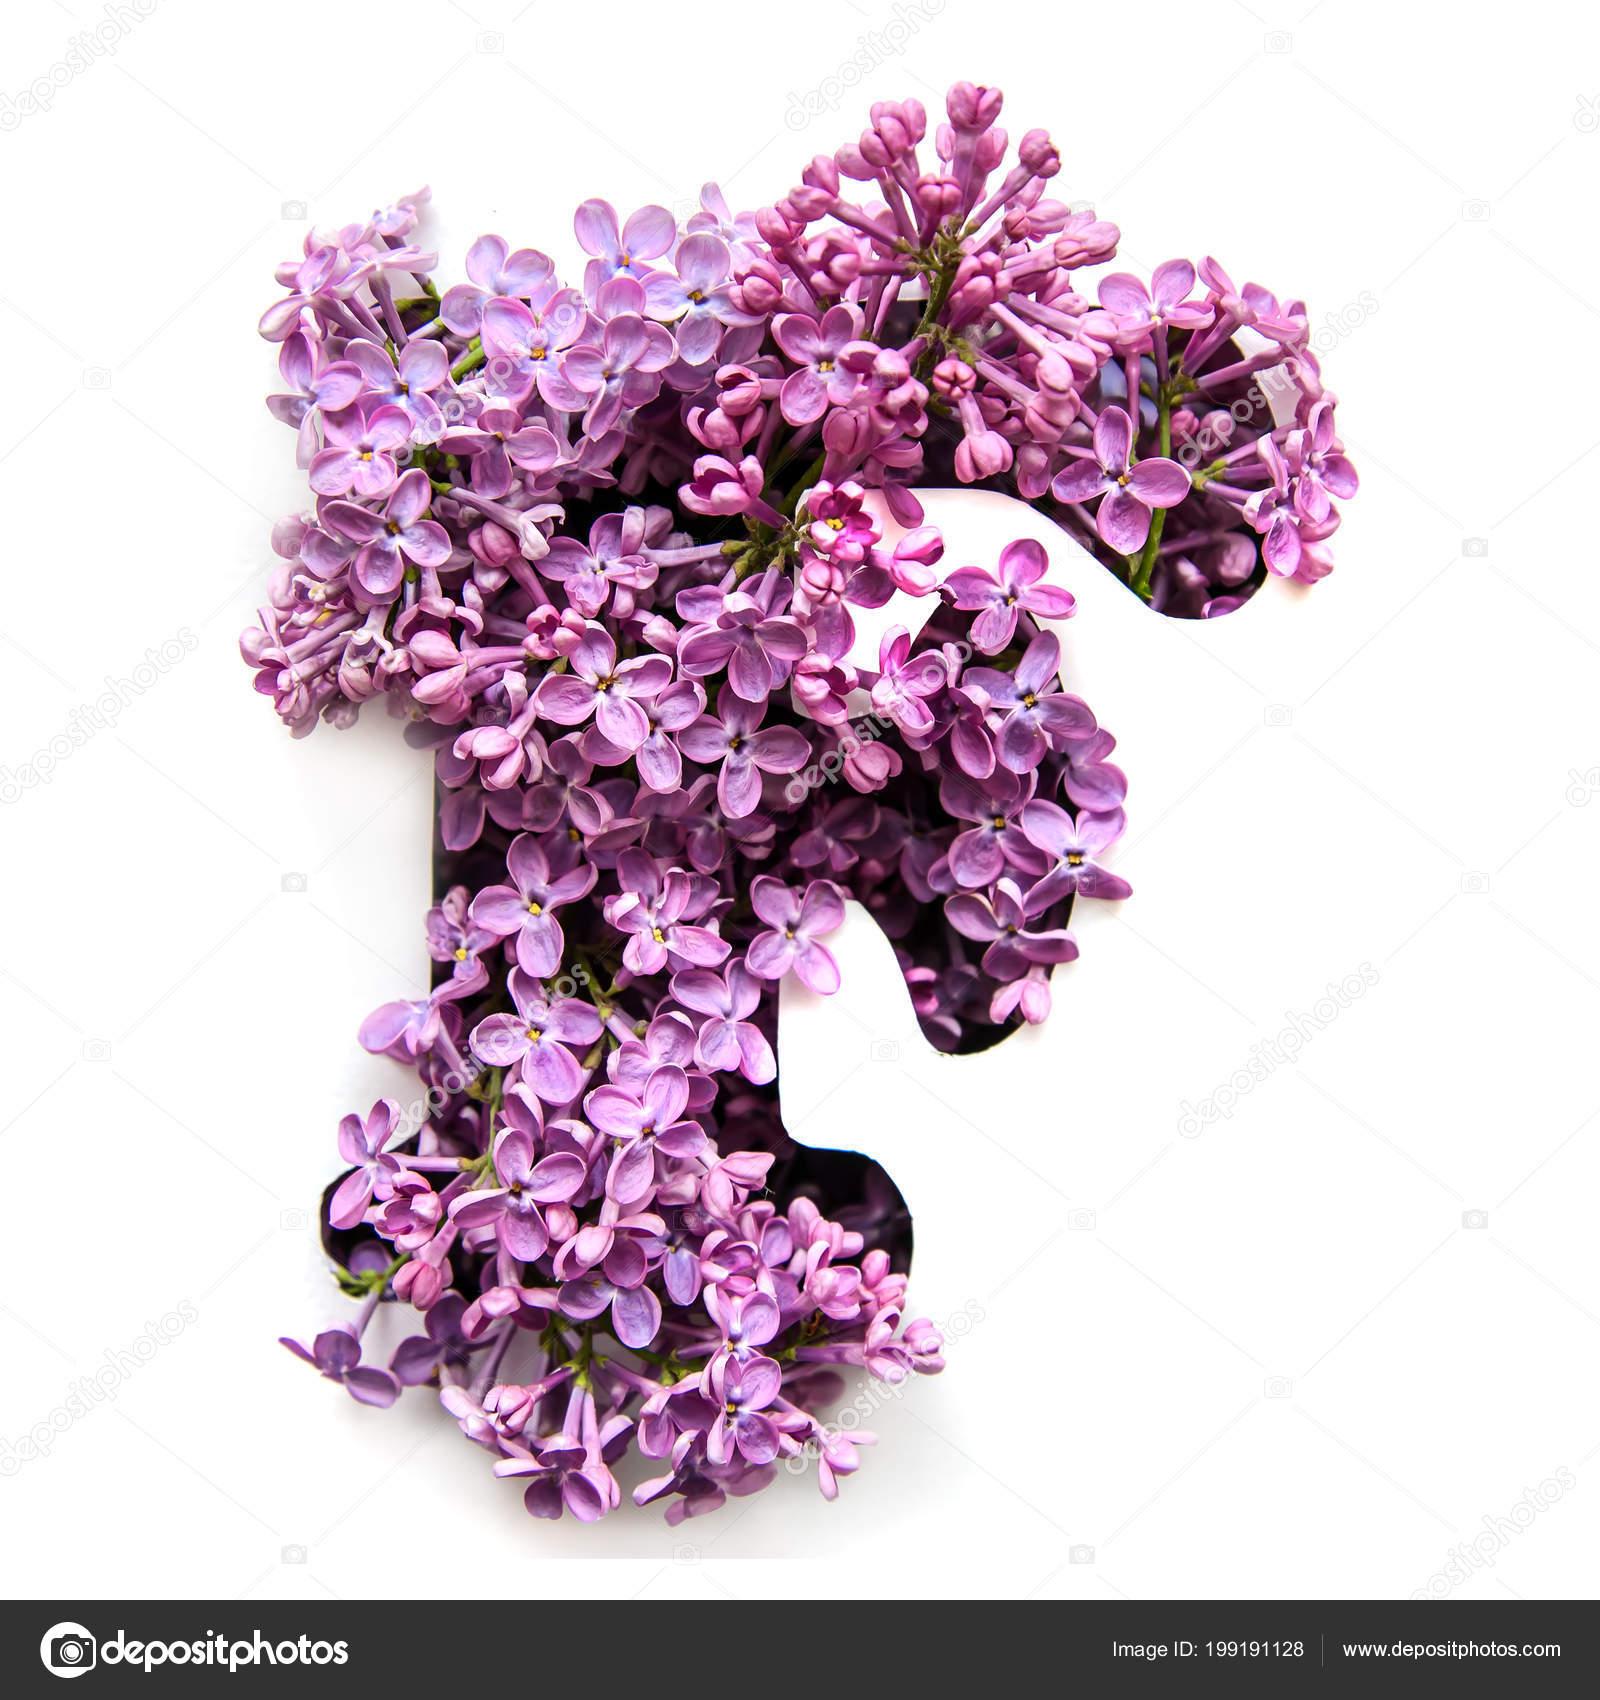 Letter English Alphabet Beautiful Bright Purple Flowers Lilac White Stencil Stock Photo C Elvirkindom Yandex Ru 199191128